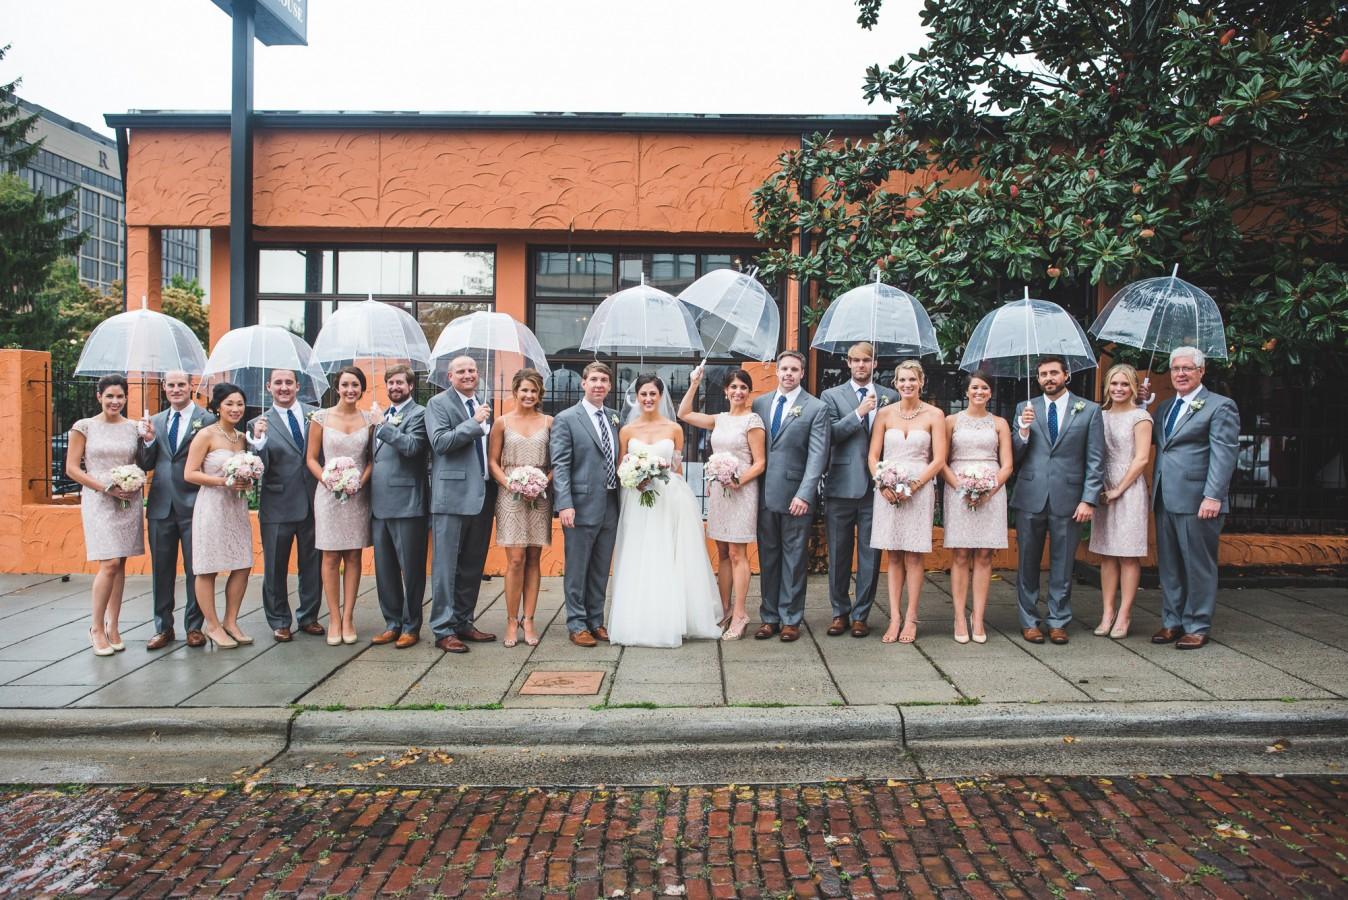 fete-photography-weddings-017